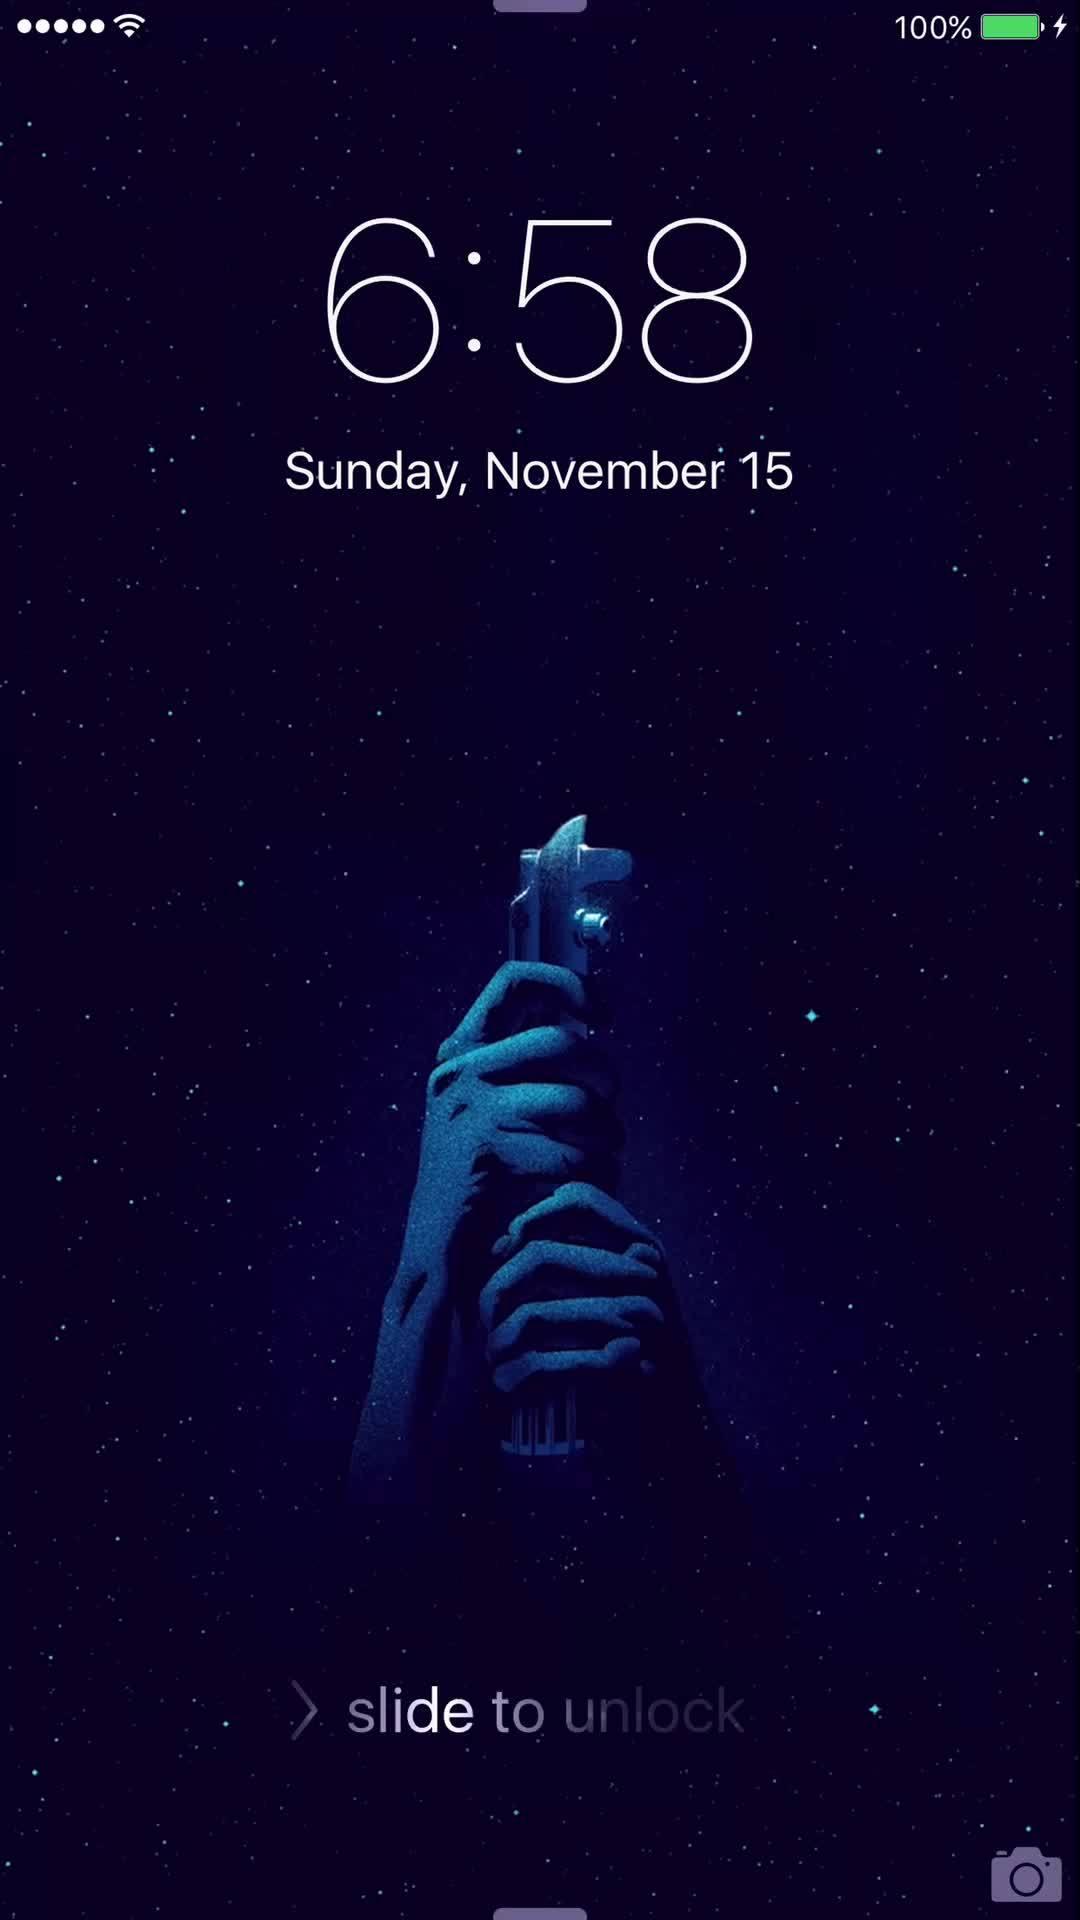 StarWars, iOSthemes, I made a custom iPhone live wallpaper! (reddit) GIFs